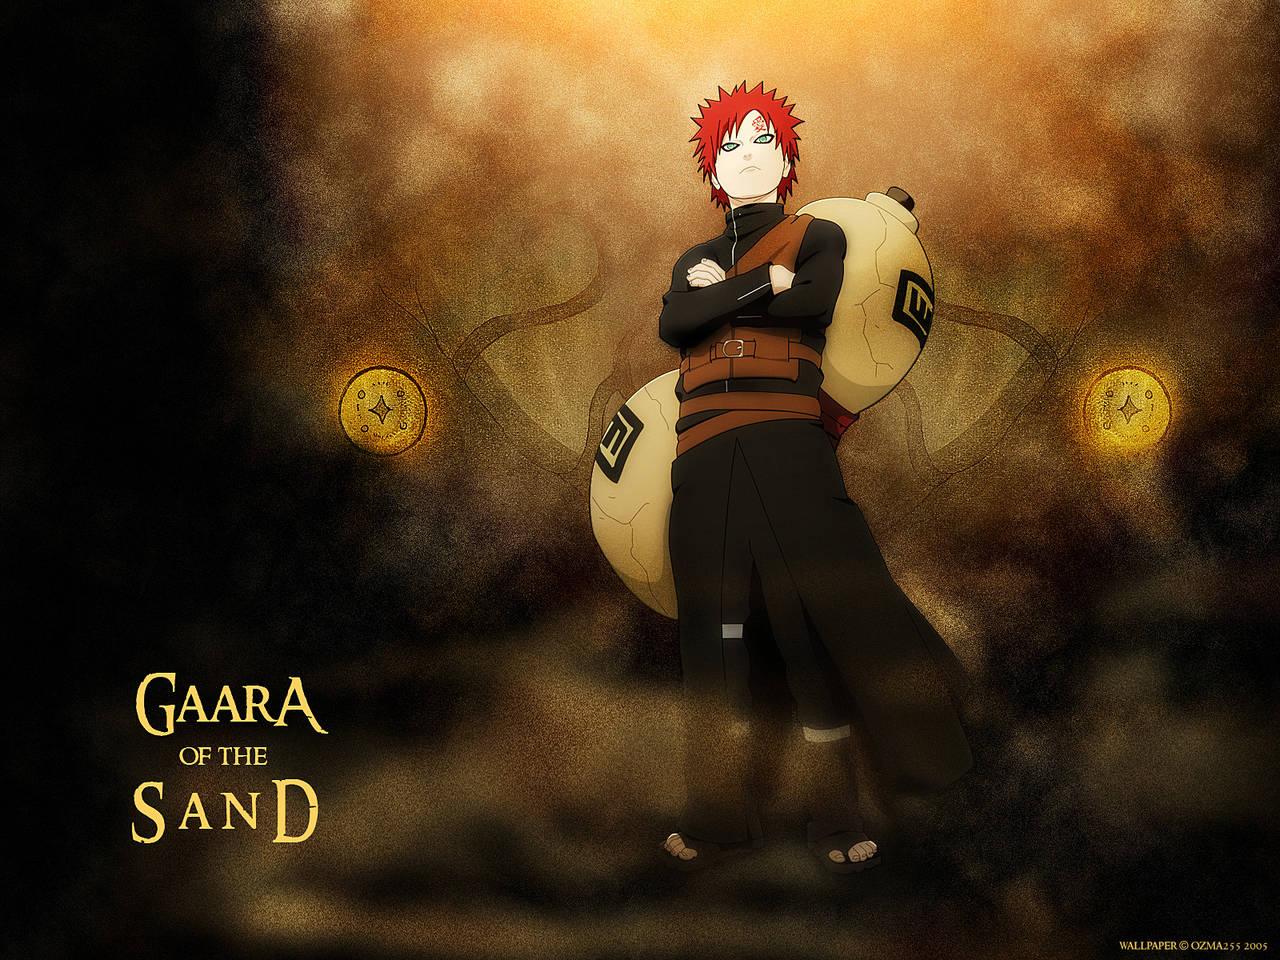 Gaara 3d Wallpaper Hd Naruto Wallpapers